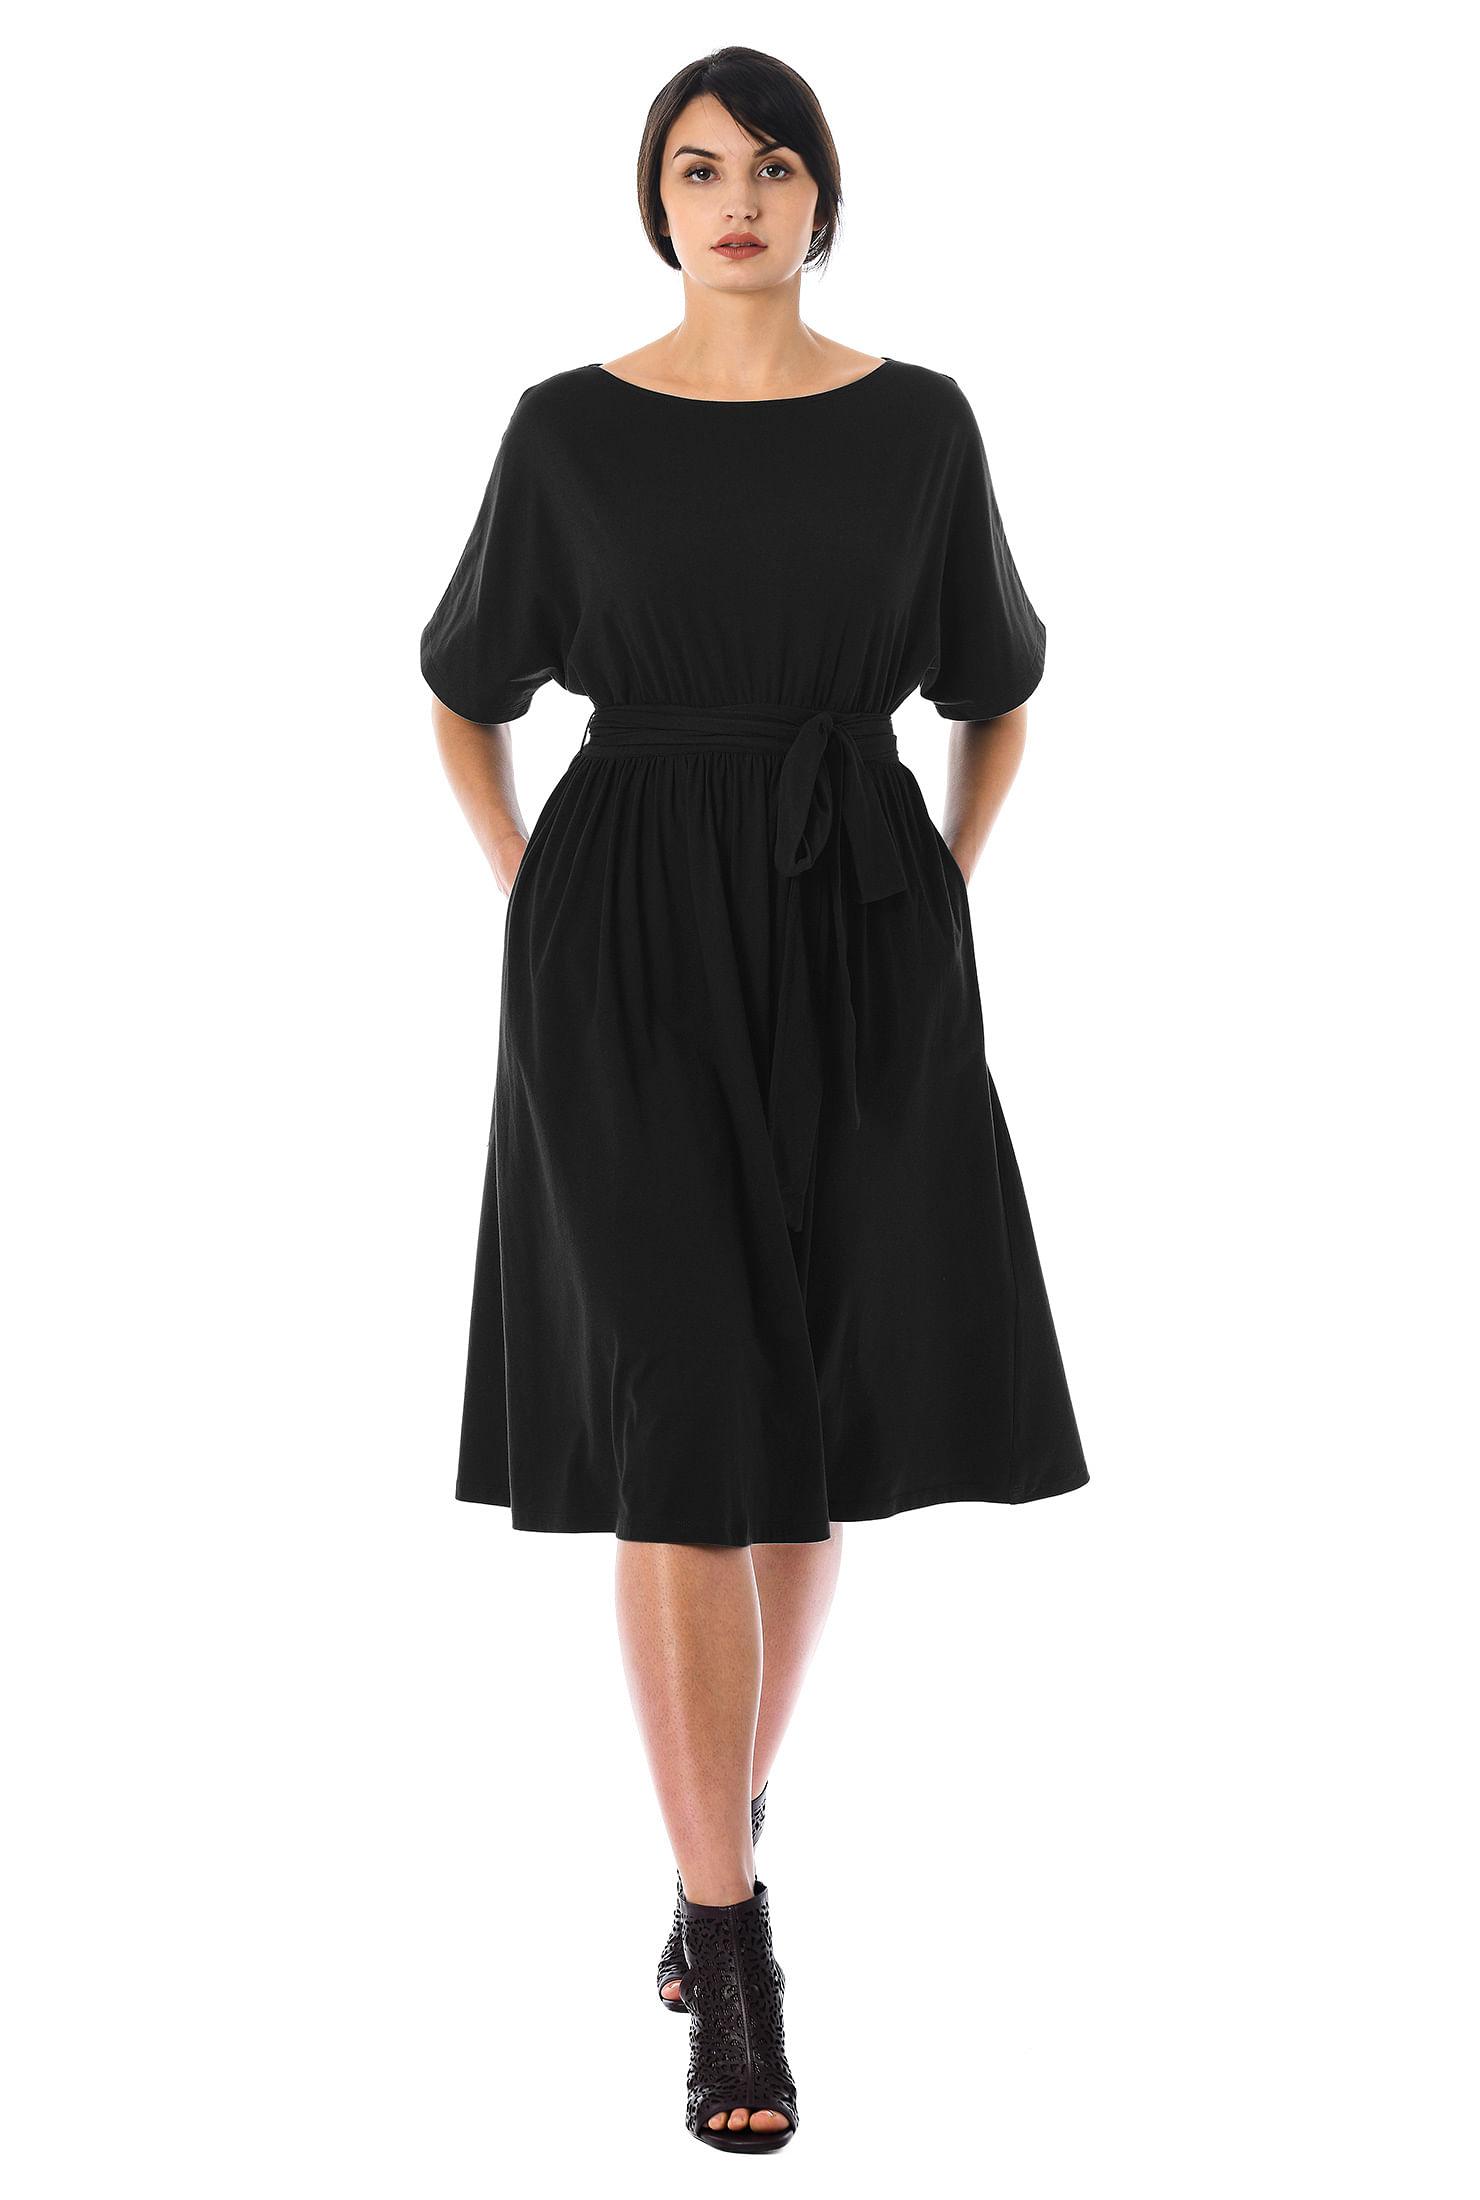 a089905b above elbow length sleeve dresses, below knee length dresses, black  dresses, boat